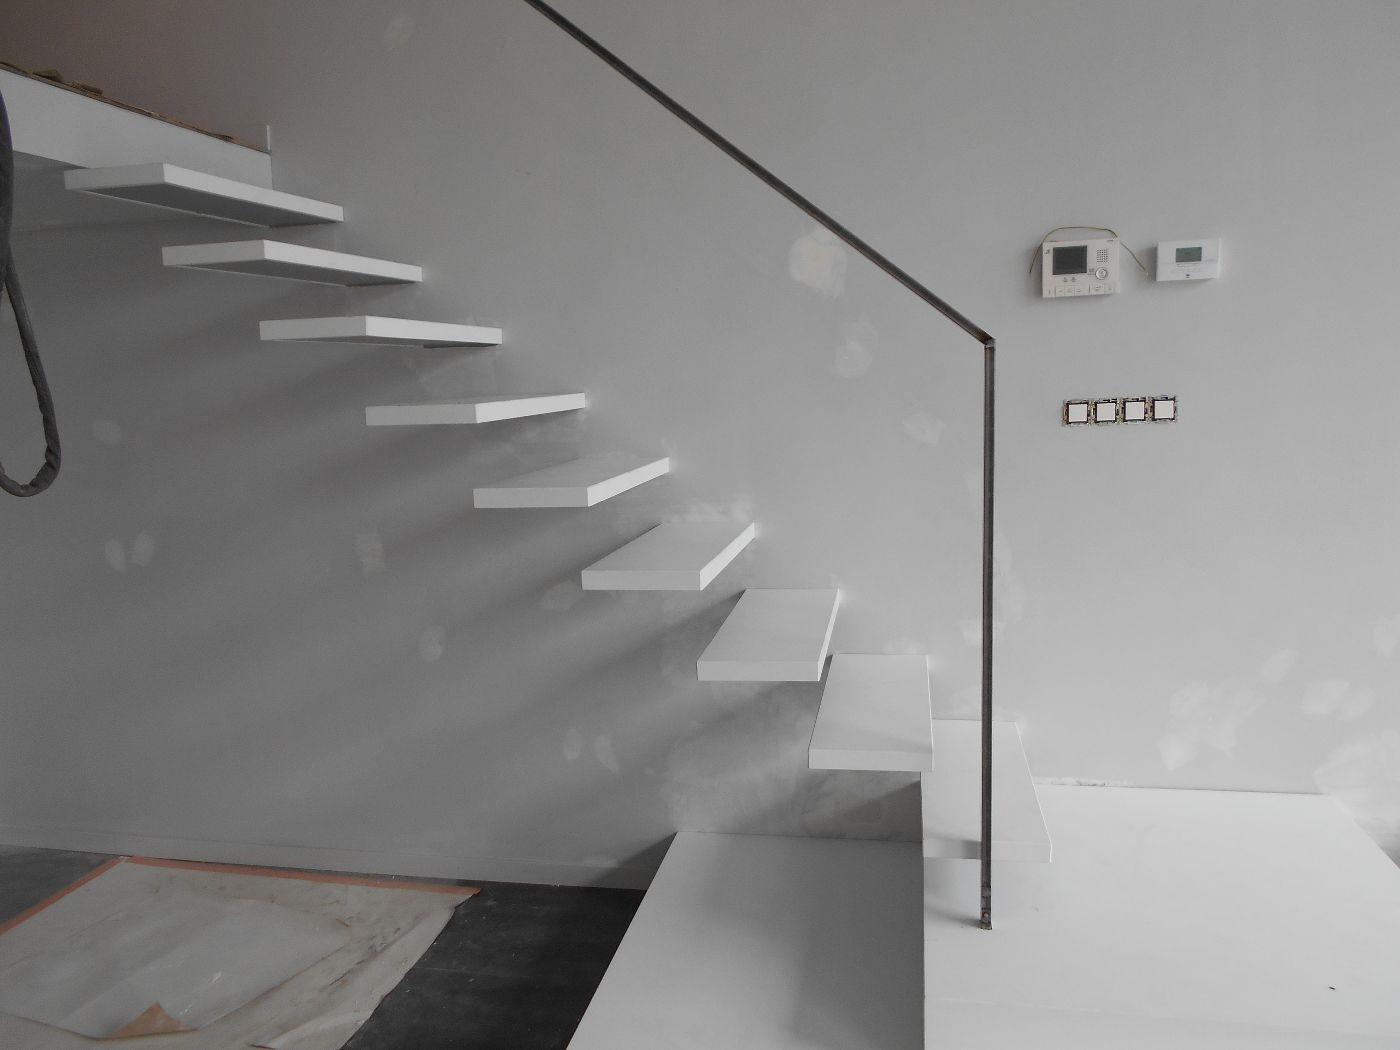 Escalier-flottant